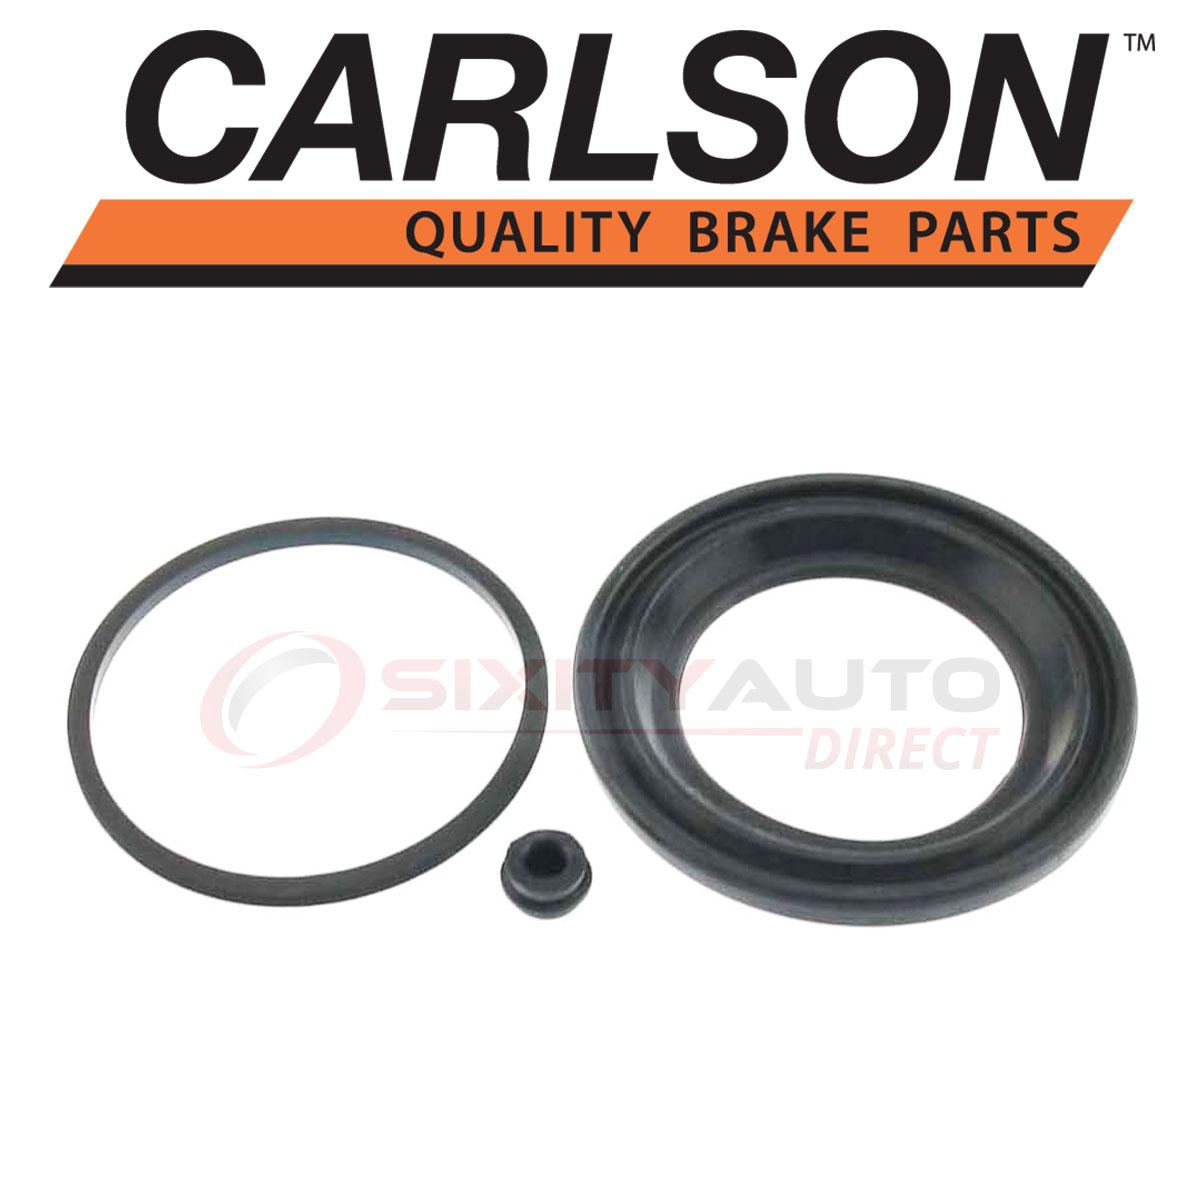 Carlson 15339 Front Brake Caliper Kit